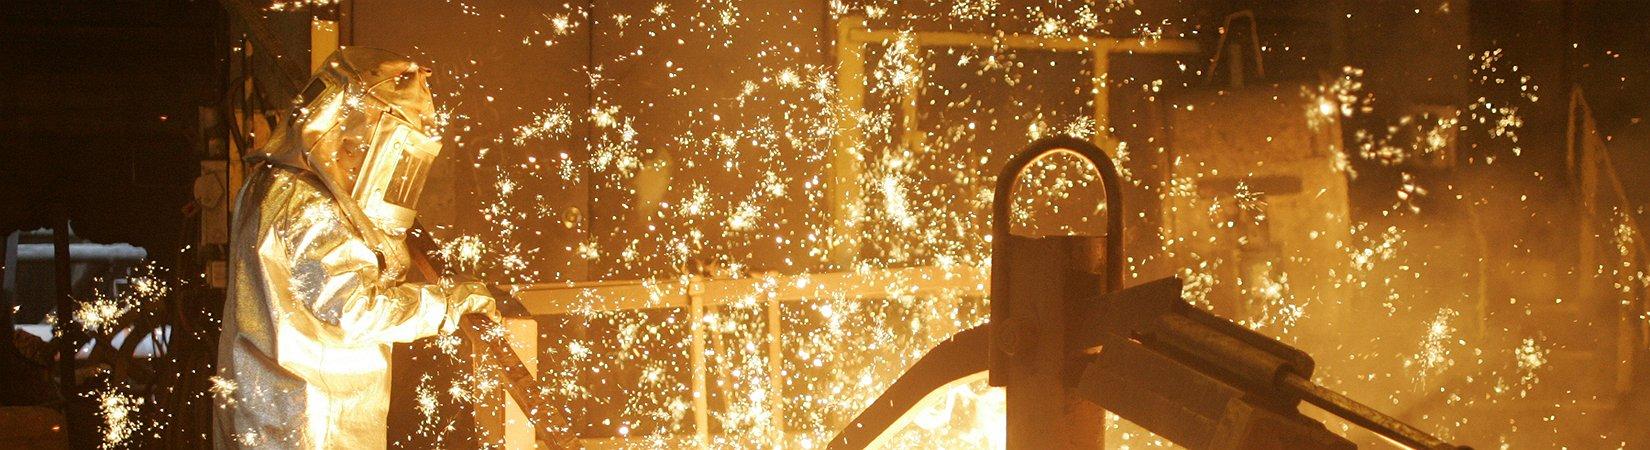 Why risk-loving investors should look at U.S. Steel